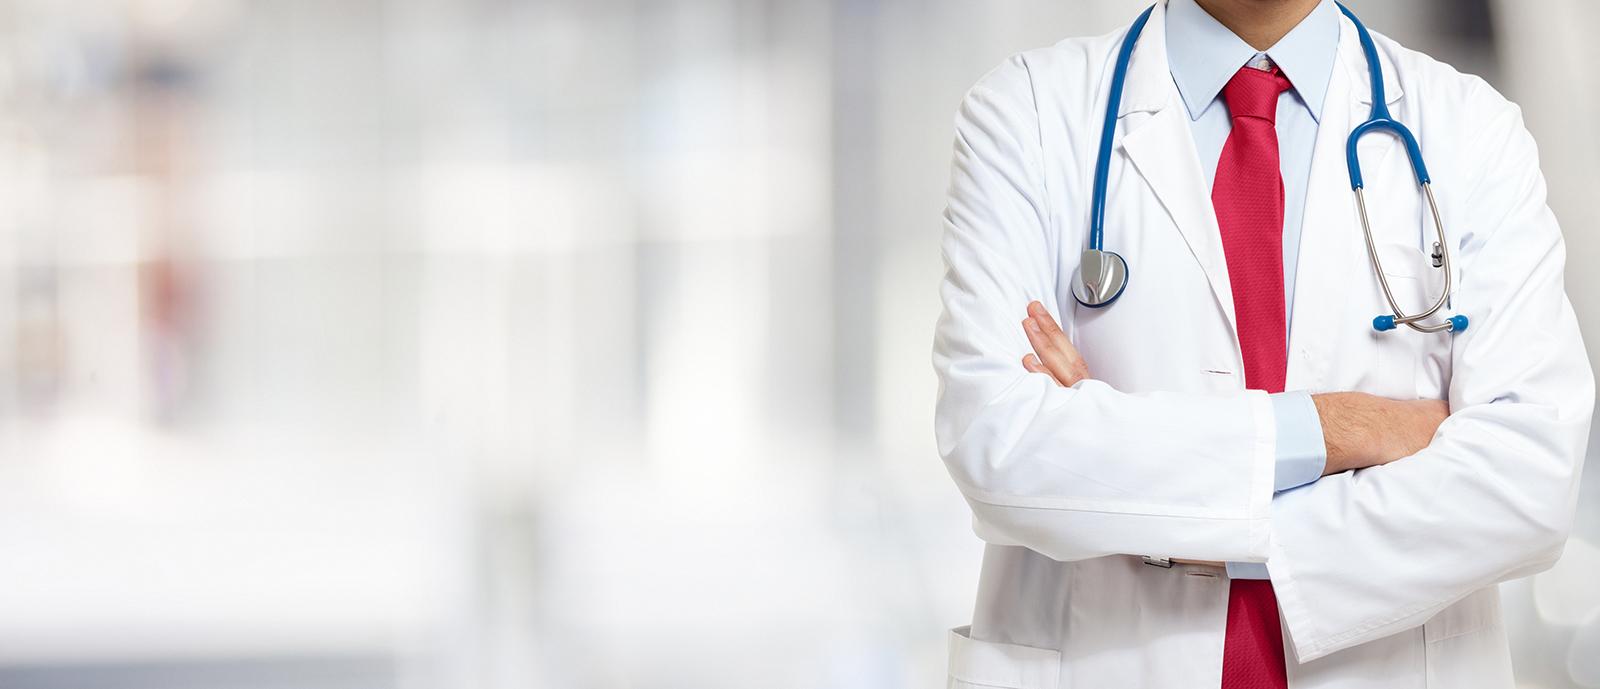 Medecin a domicile, Medecin de garde a domicile,sos medecin